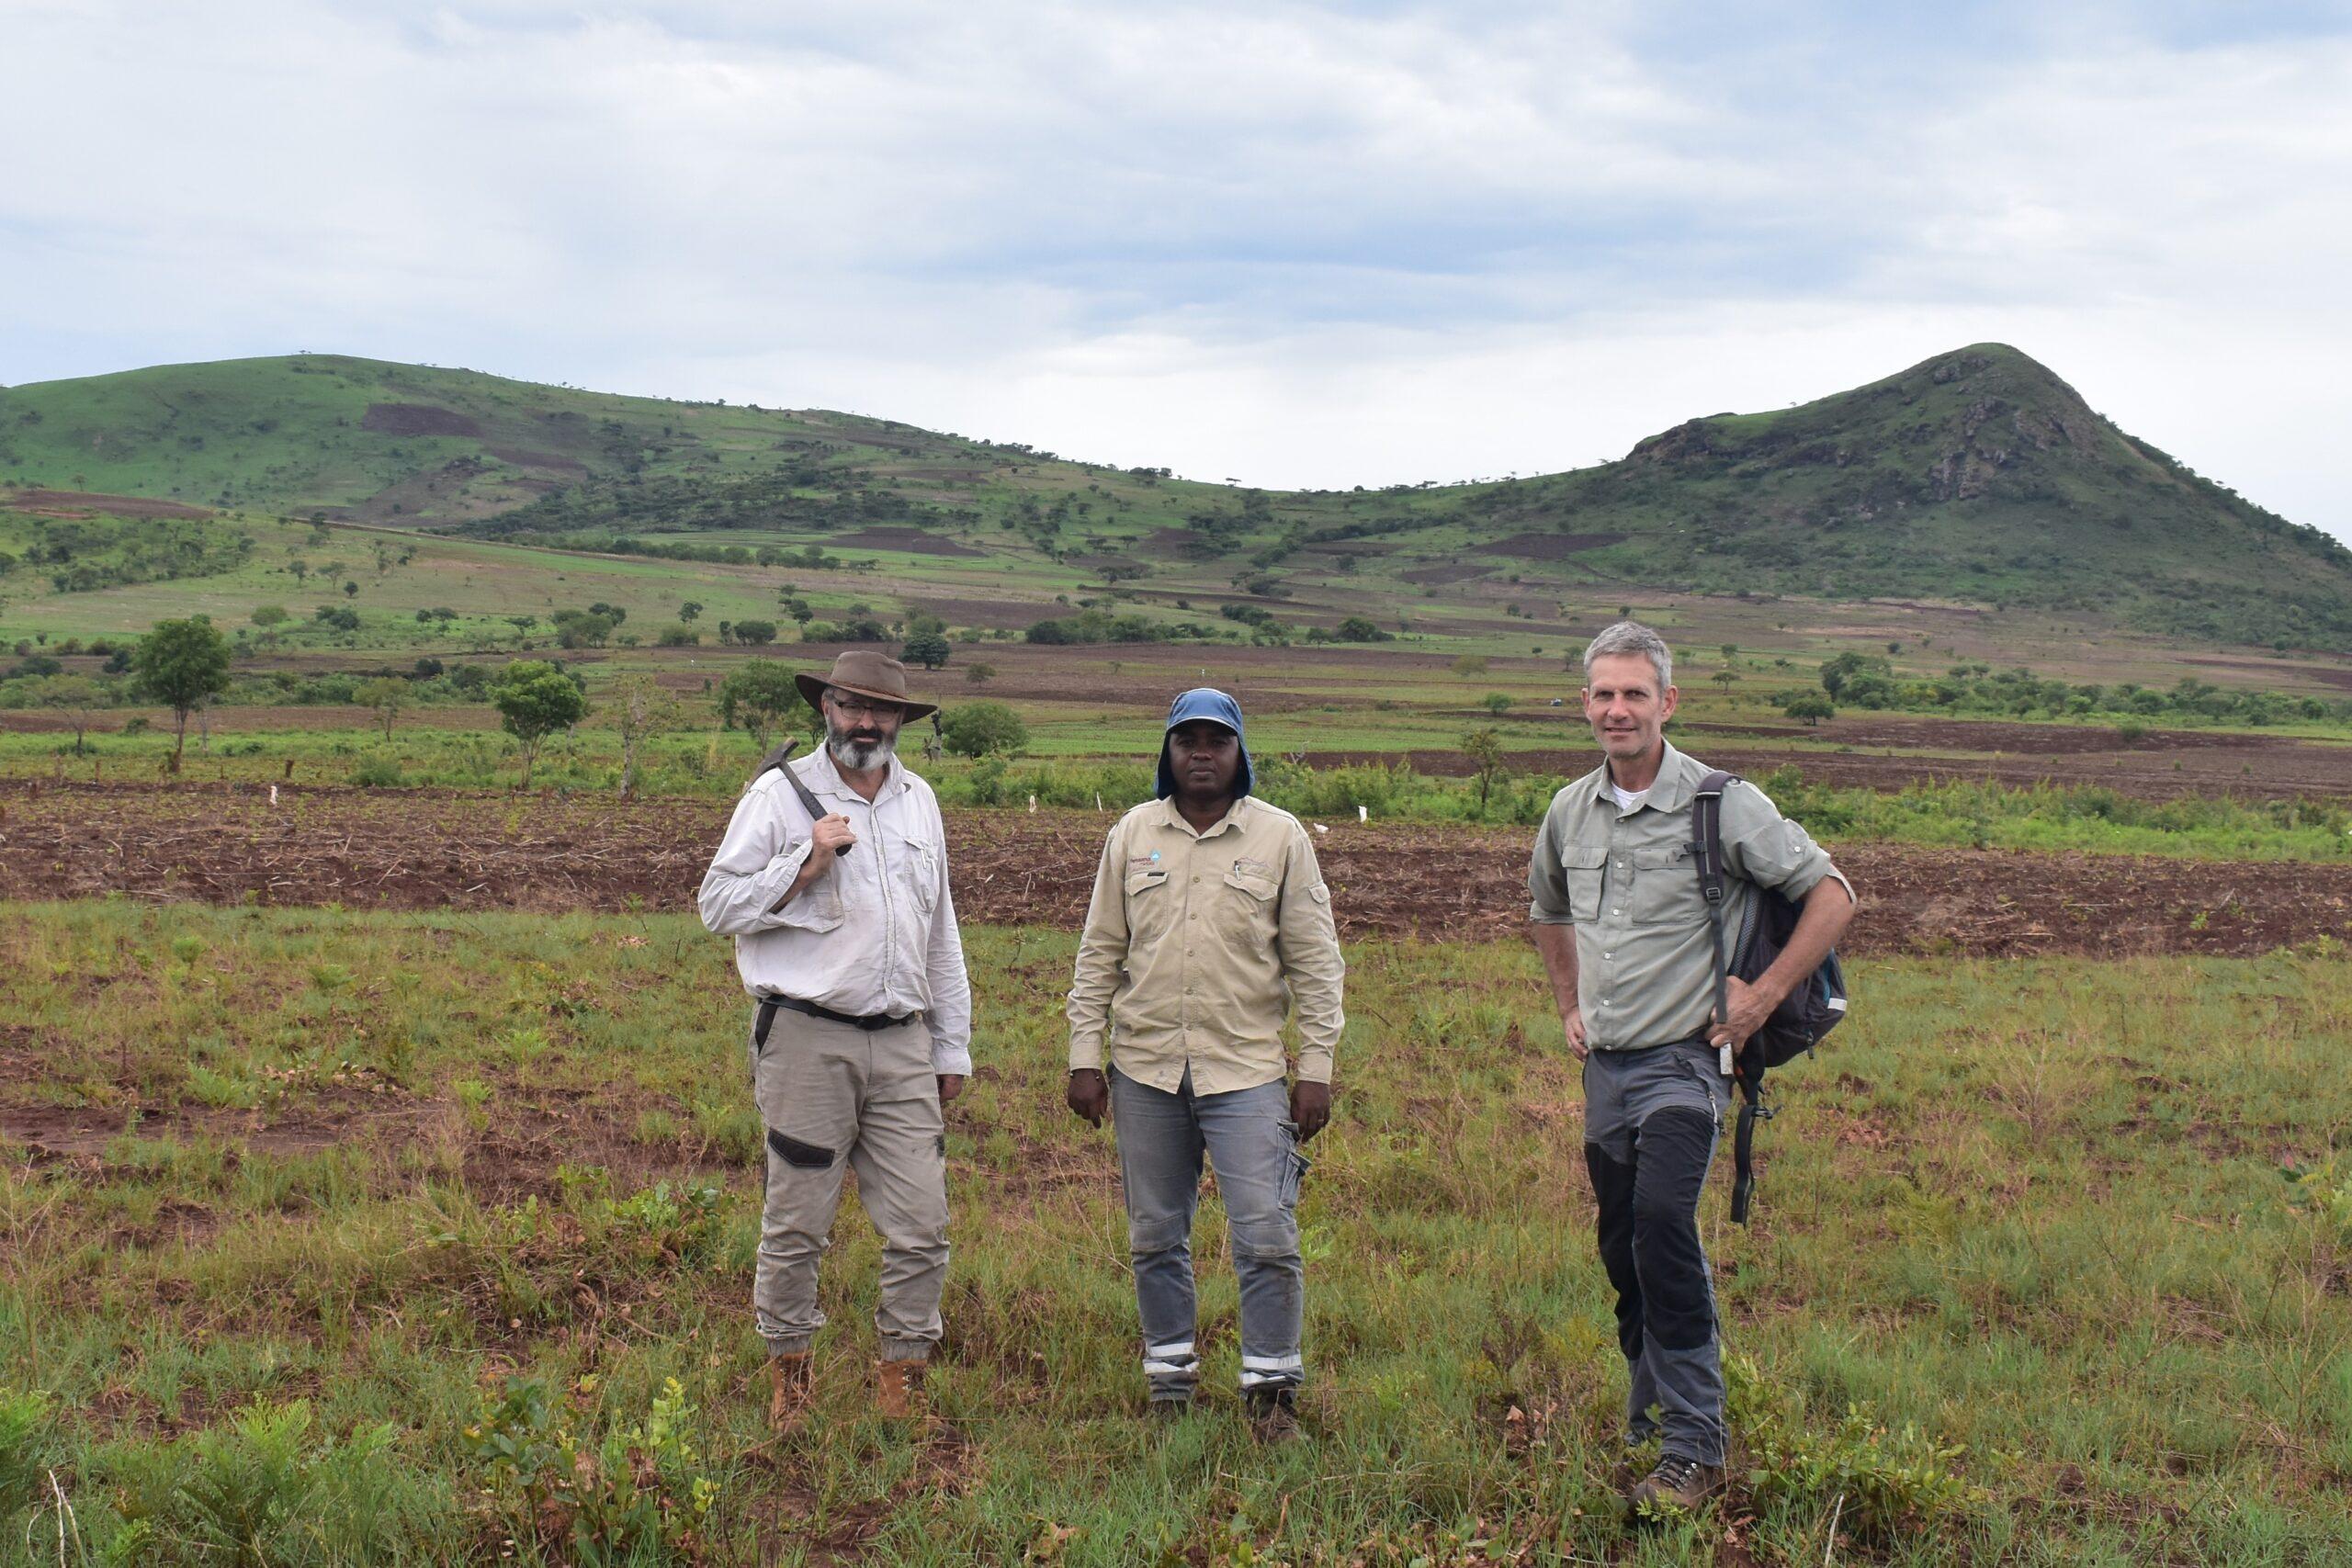 COO Dave Hammond, Geologist Benedito Madeleno and Site Manager Gavin Doyle - November 2019